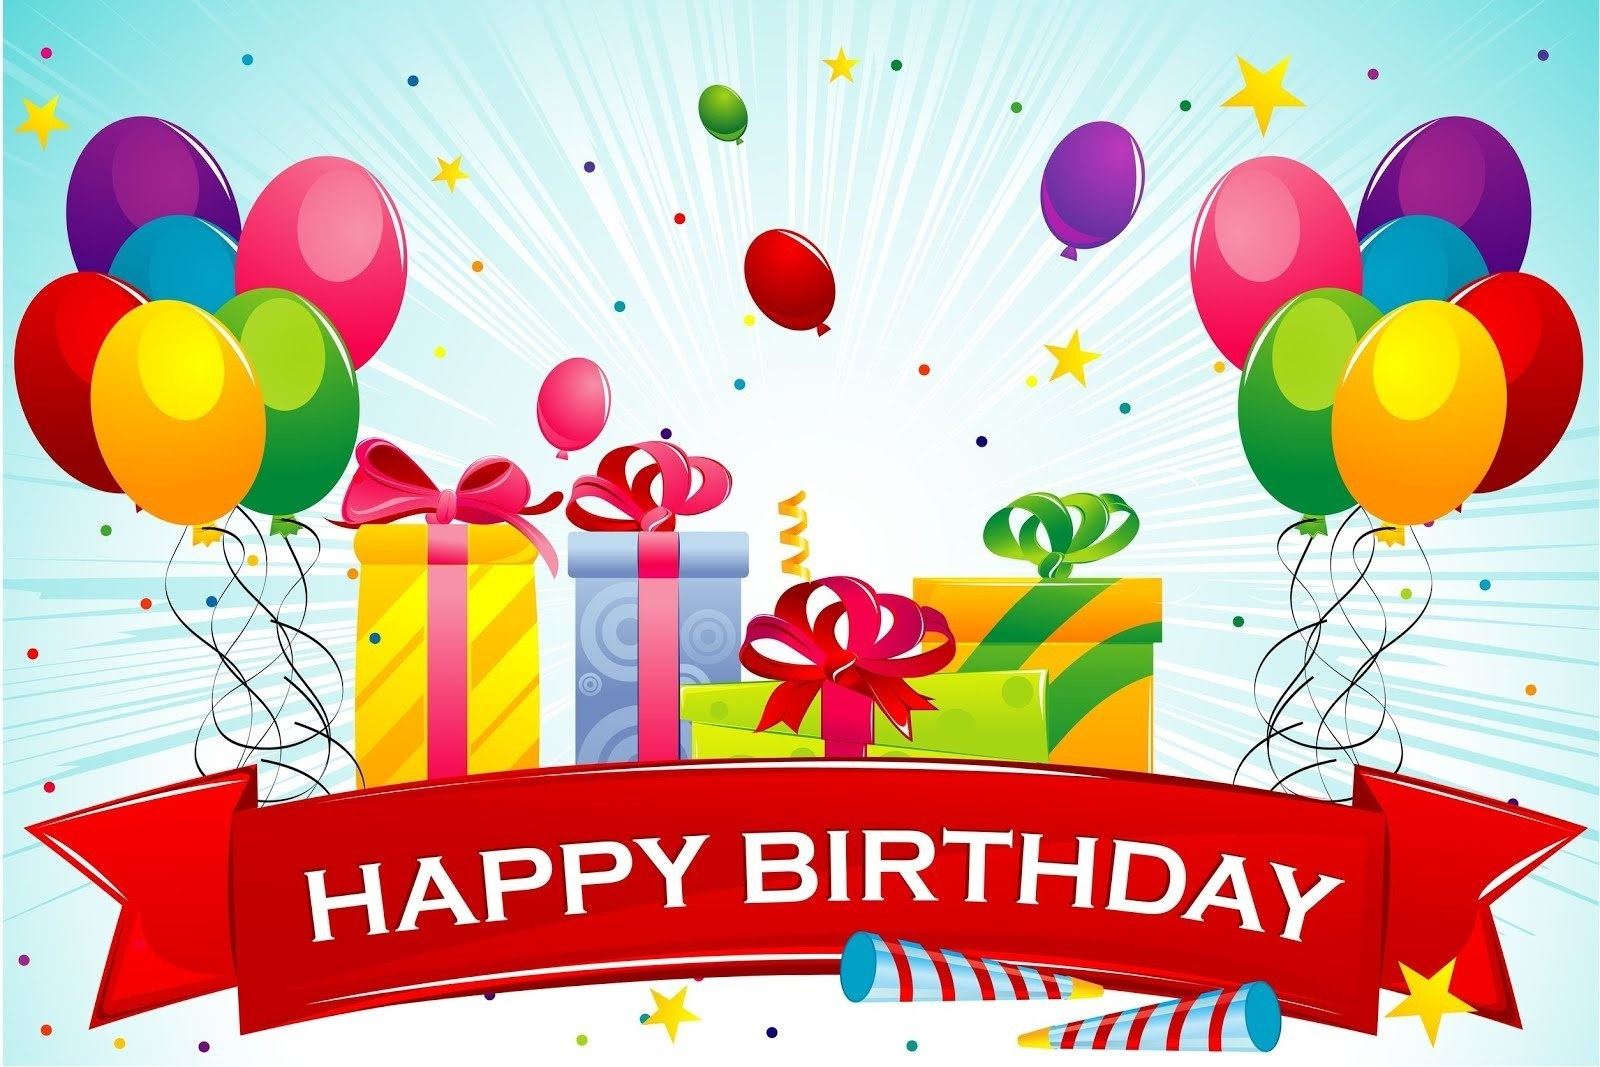 Happy birthday Lisa! | Arnel Pineda Official Site